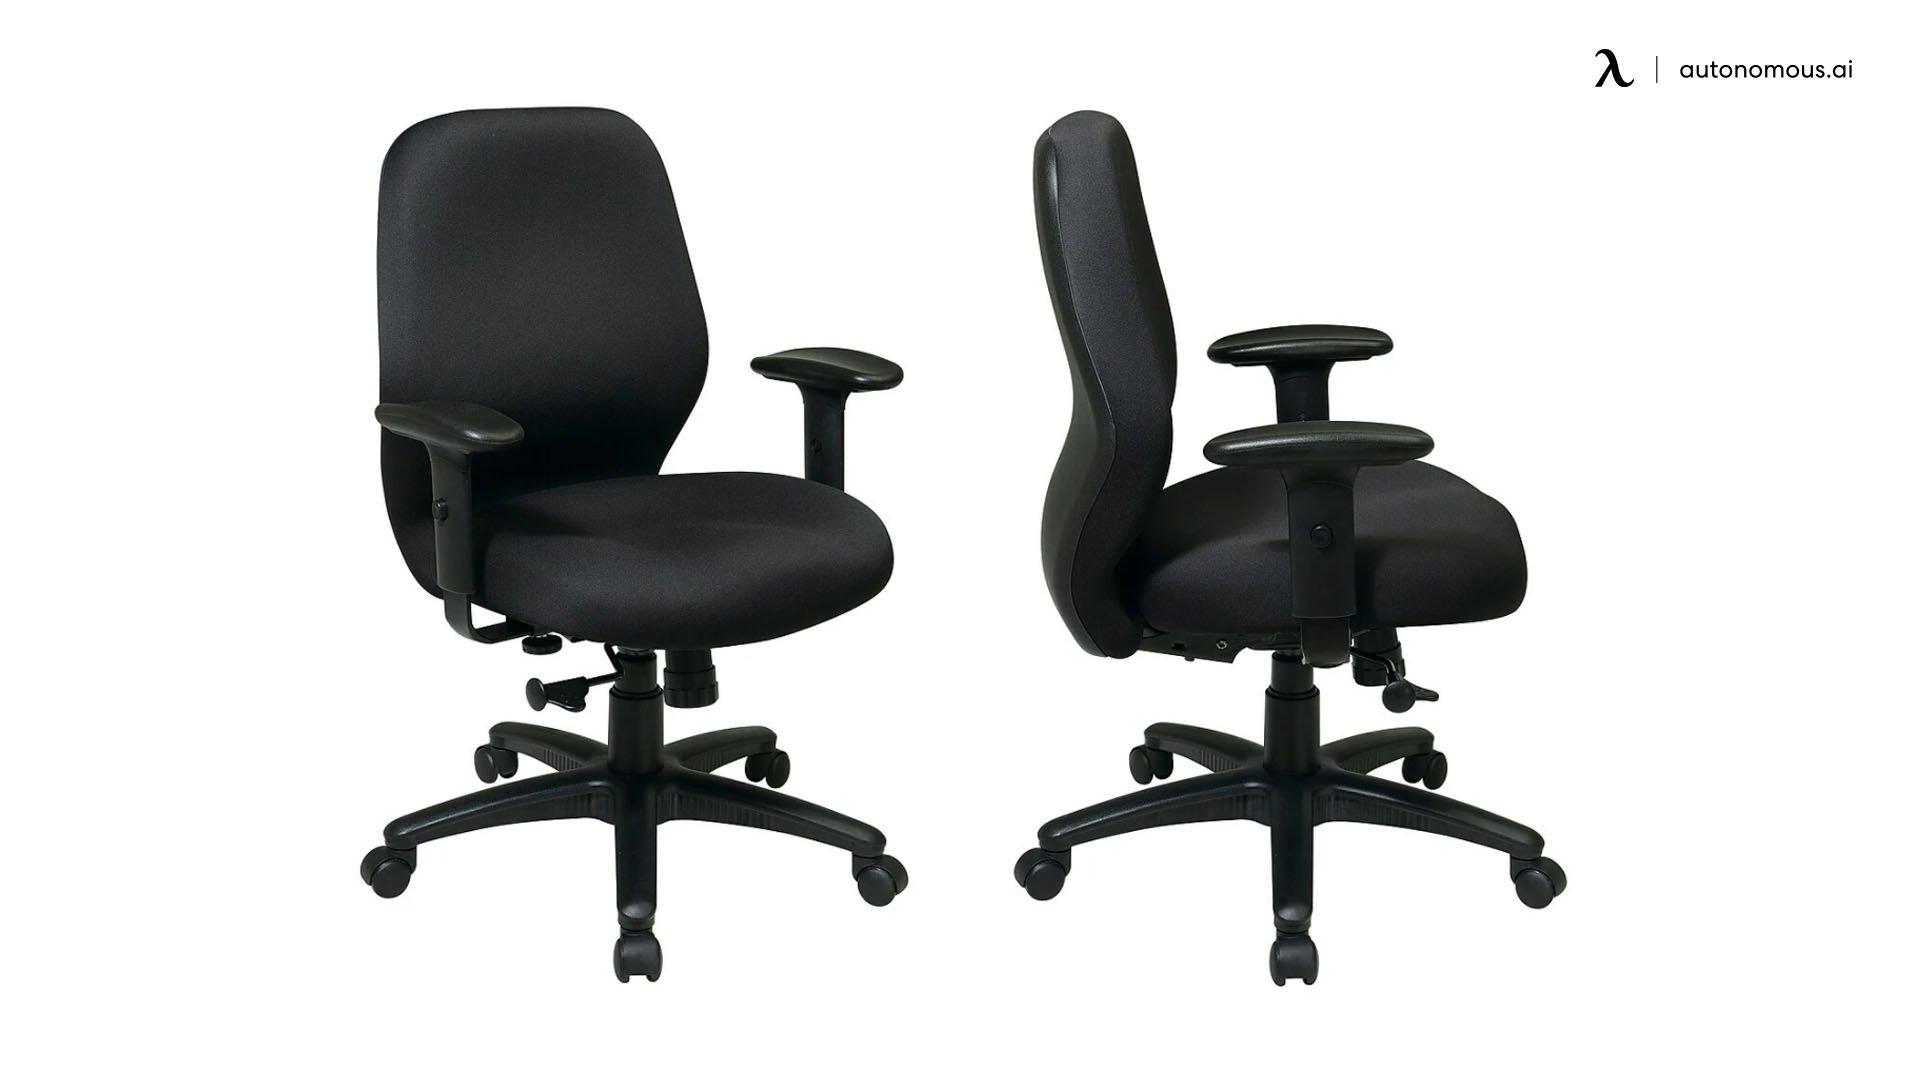 Ergonomic Chair by WorkSmart